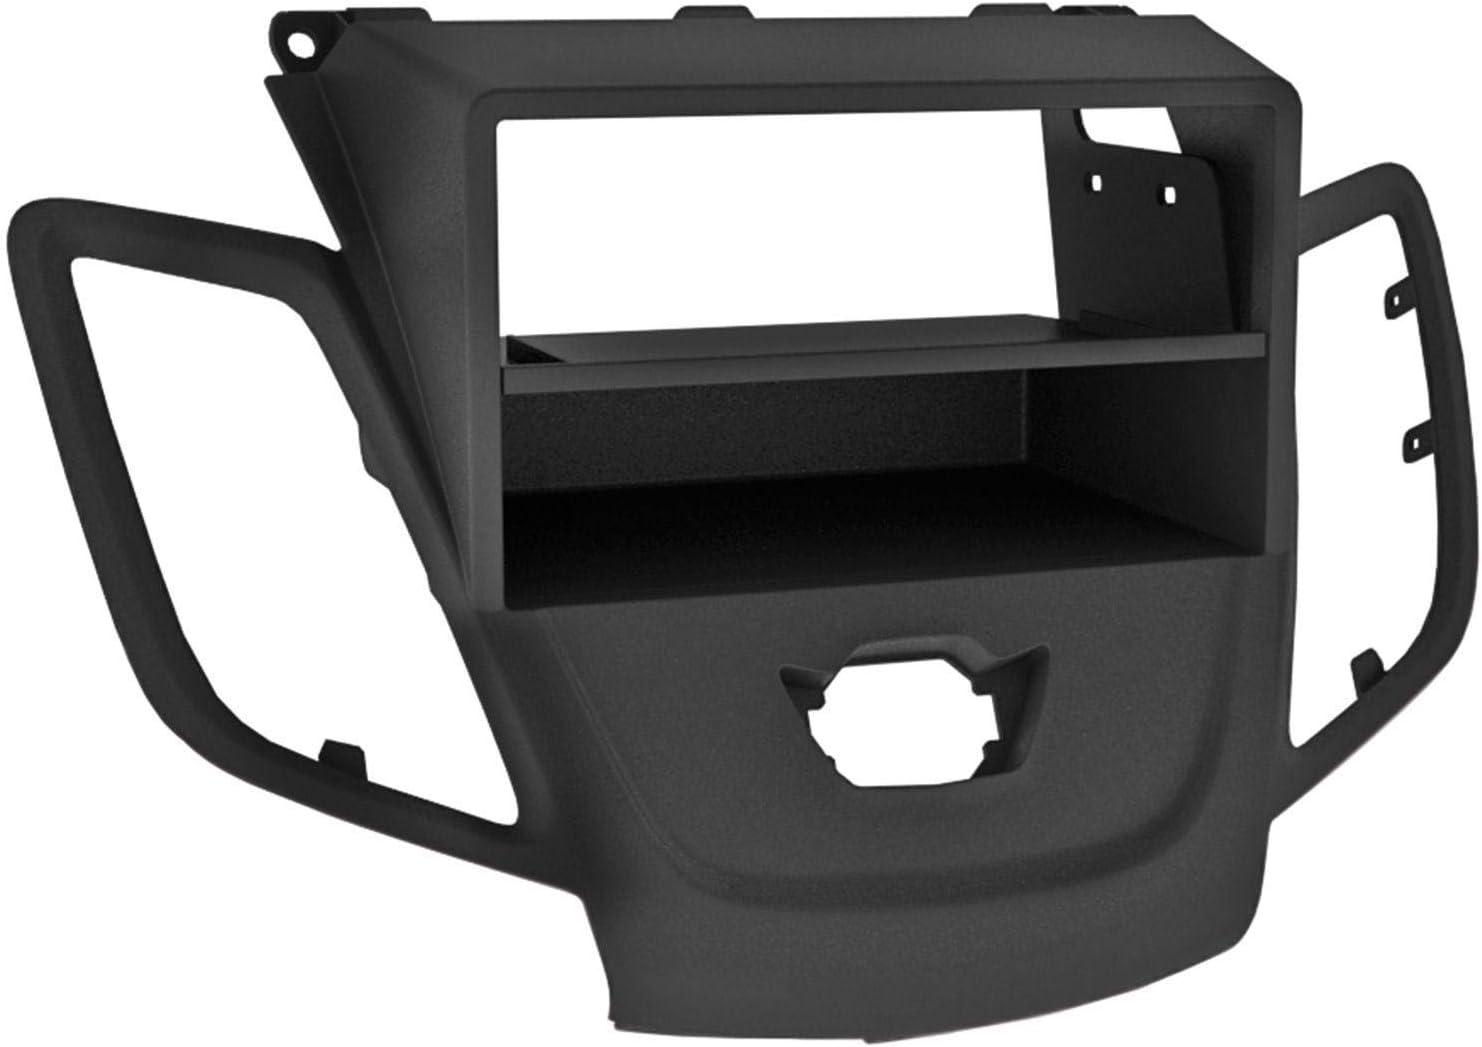 Watermark WM-6359.1 Fa/çade dautoradio Double DIN pour Ford Fiesta MK7 JA8 2008-2013 Noir